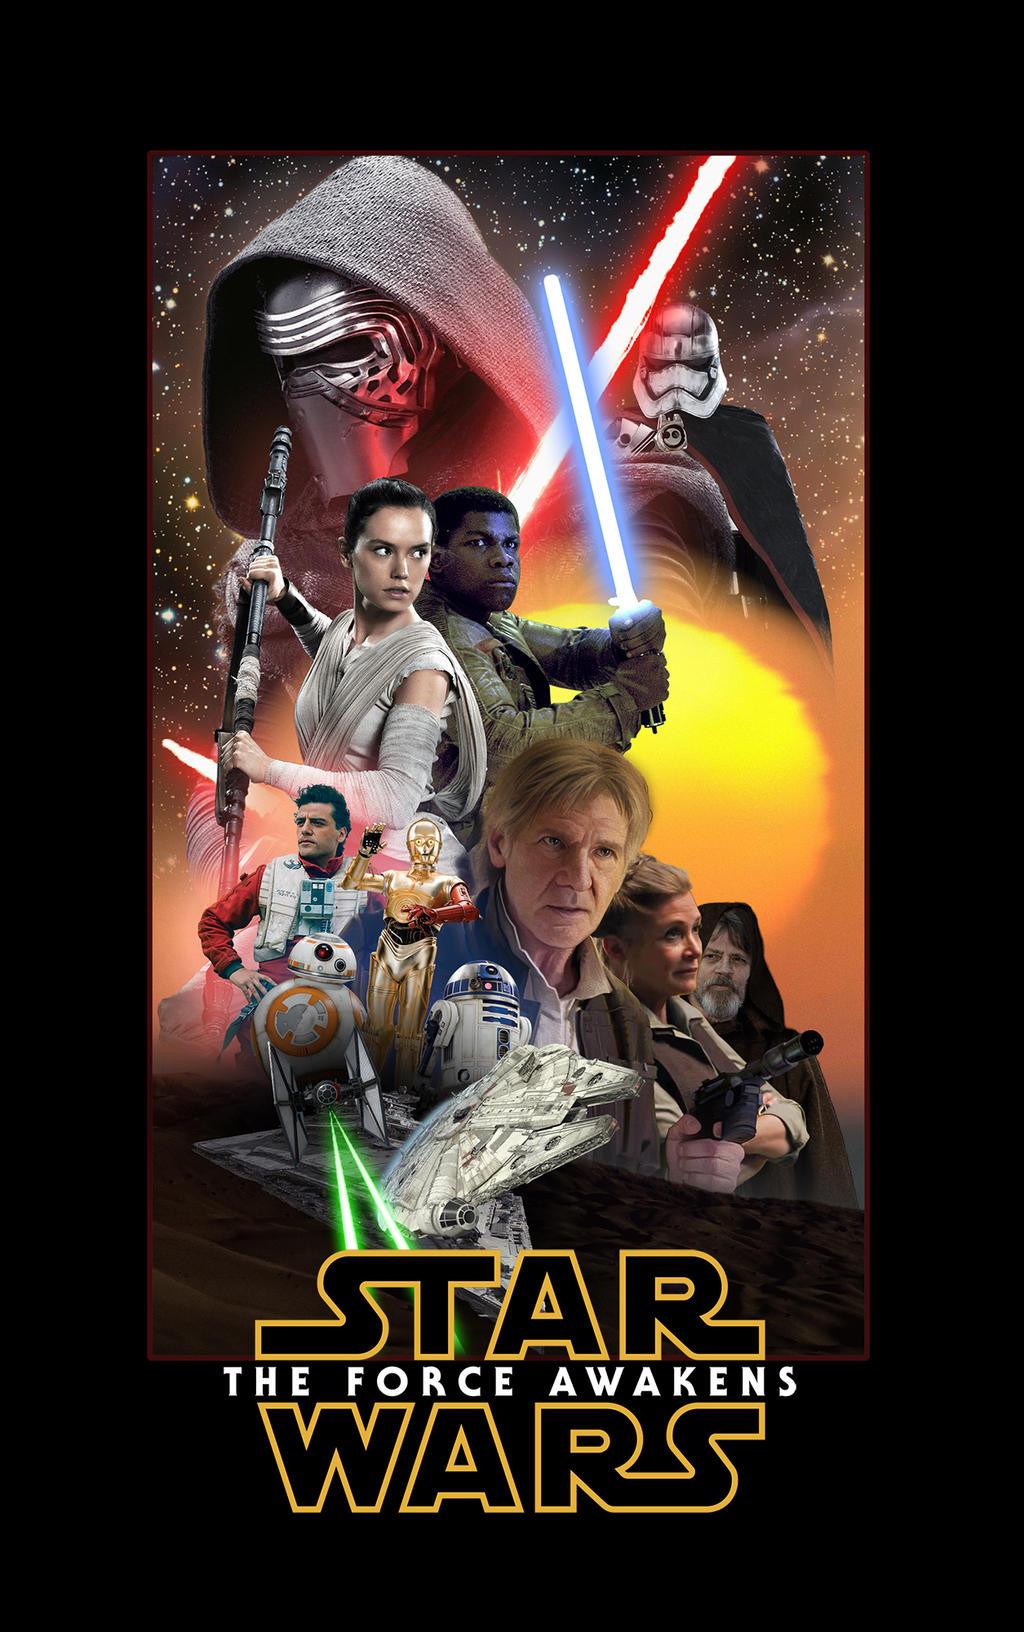 star wars the force awakens poster by dan zhbanov on deviantart